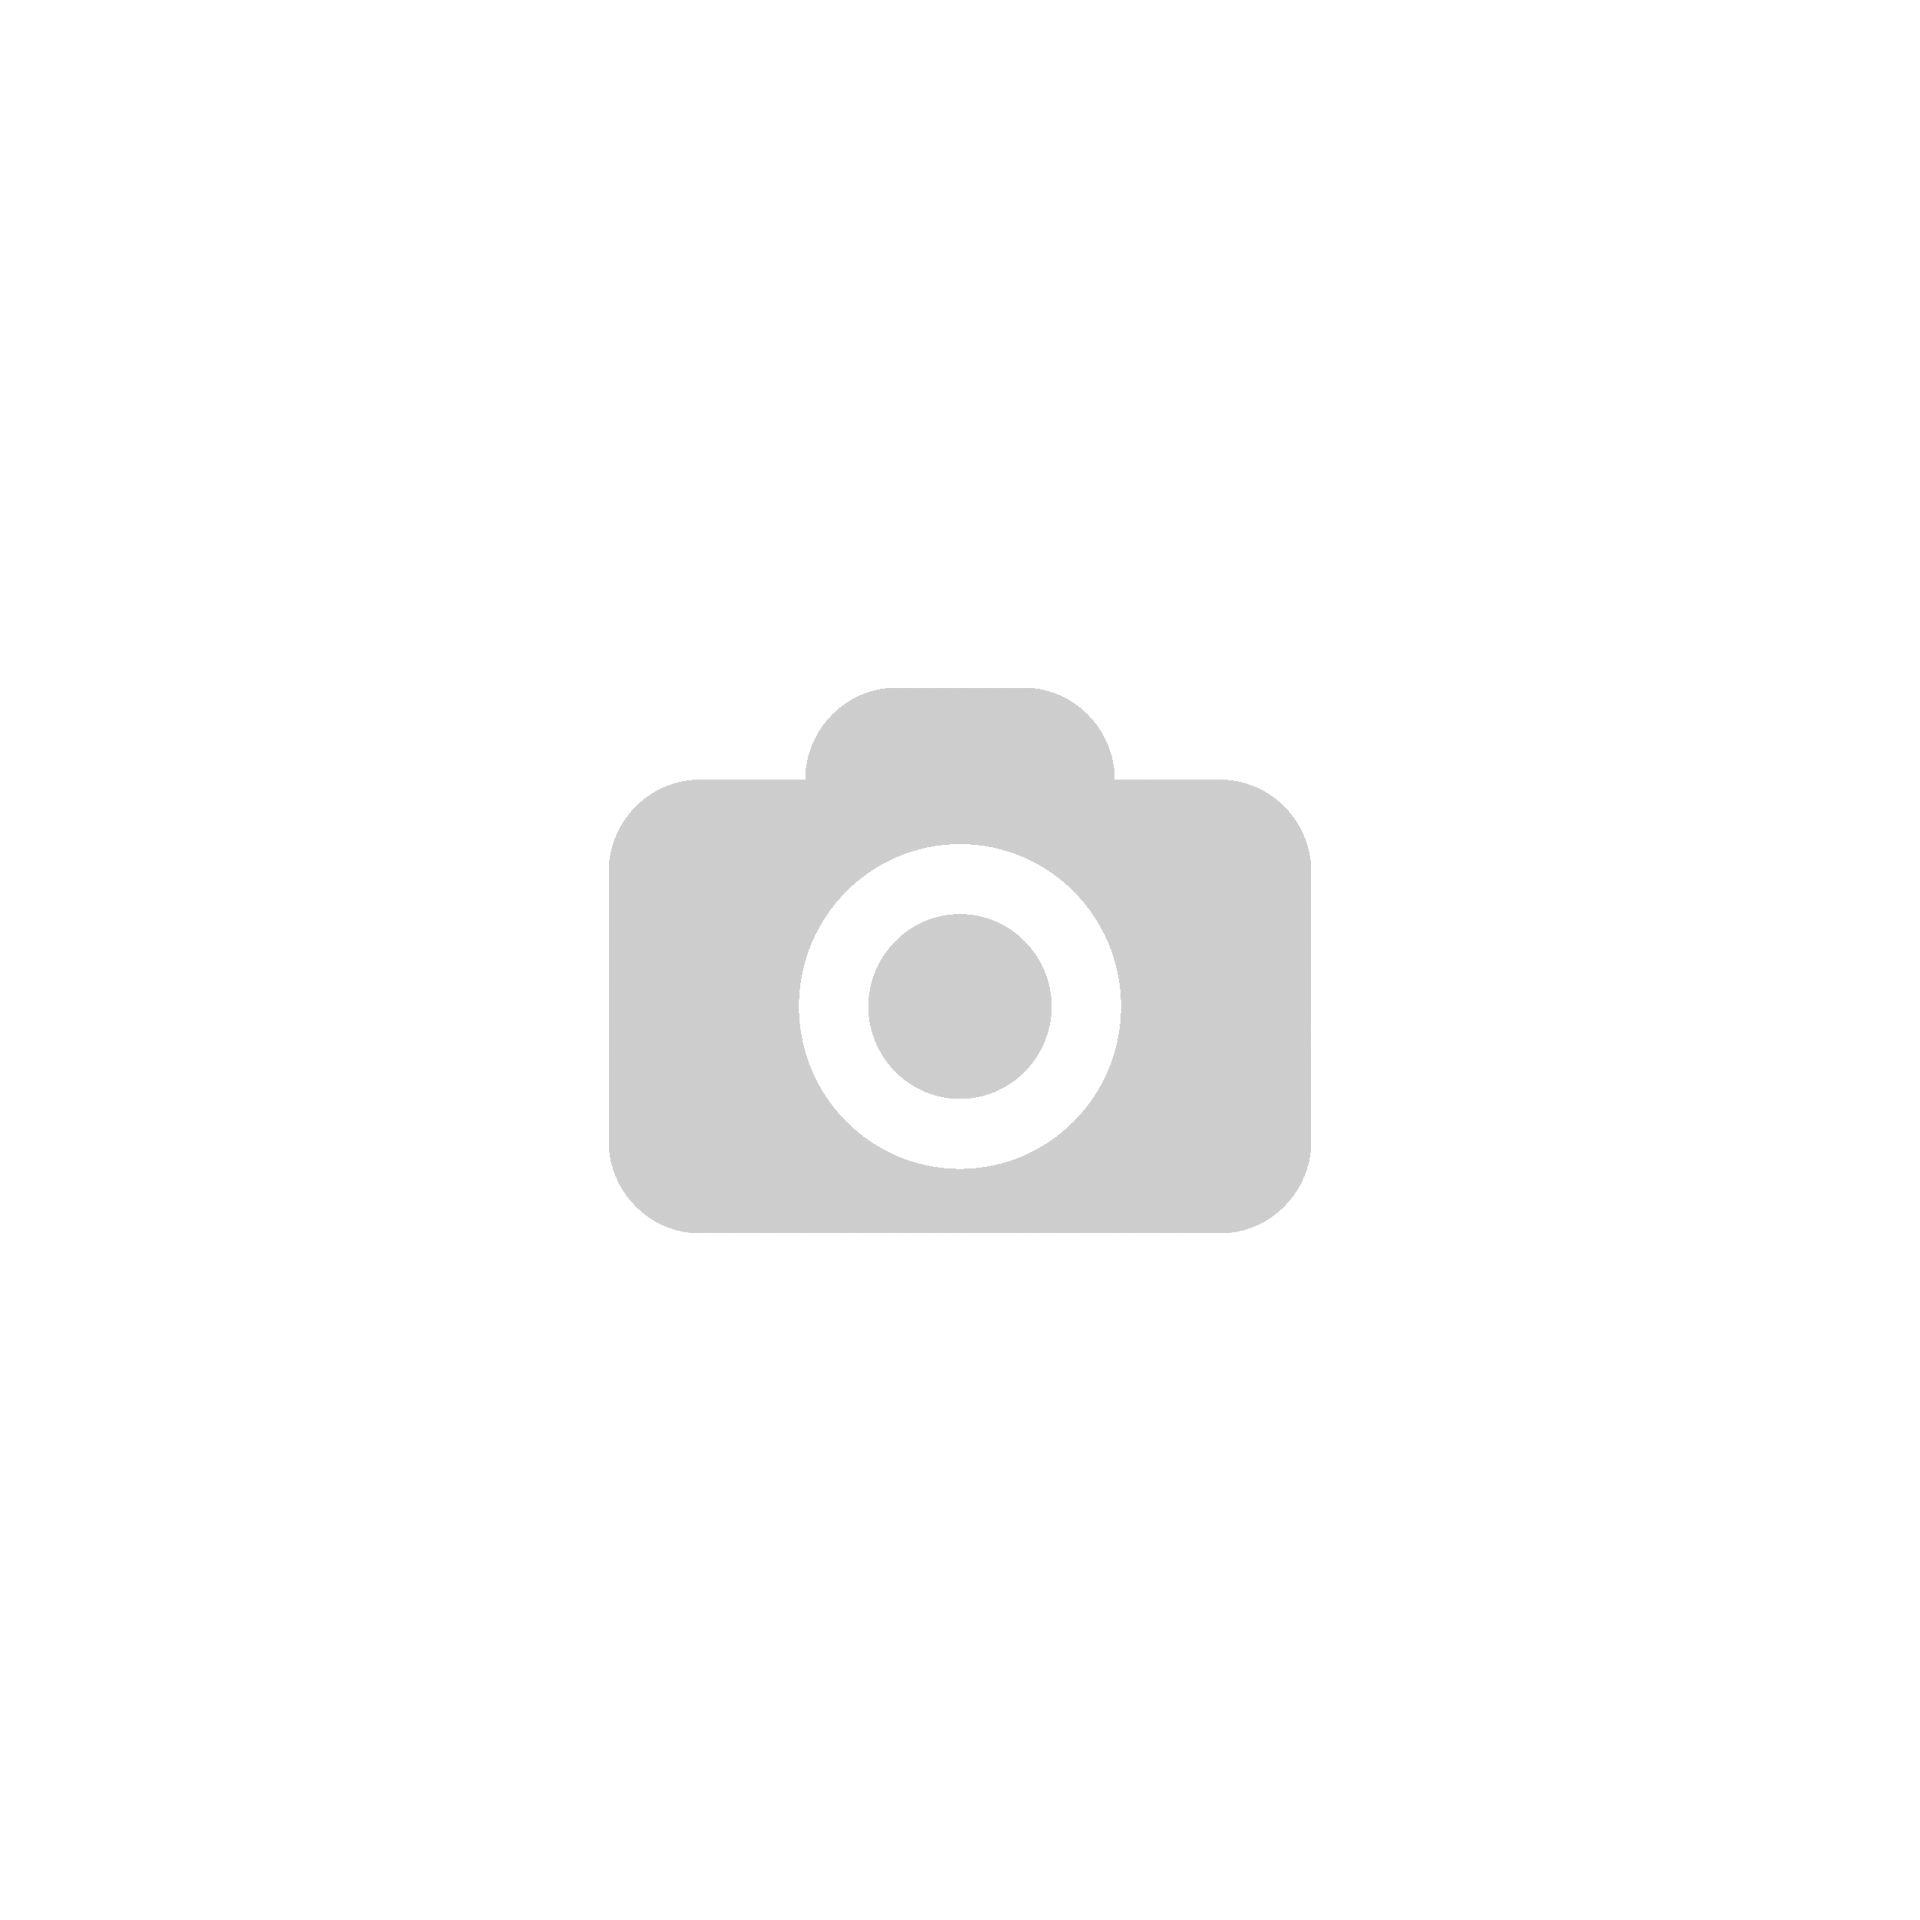 64c788f6d1 KS60 - Xenon kabát, sárga   Lavigo-Agro Kft.